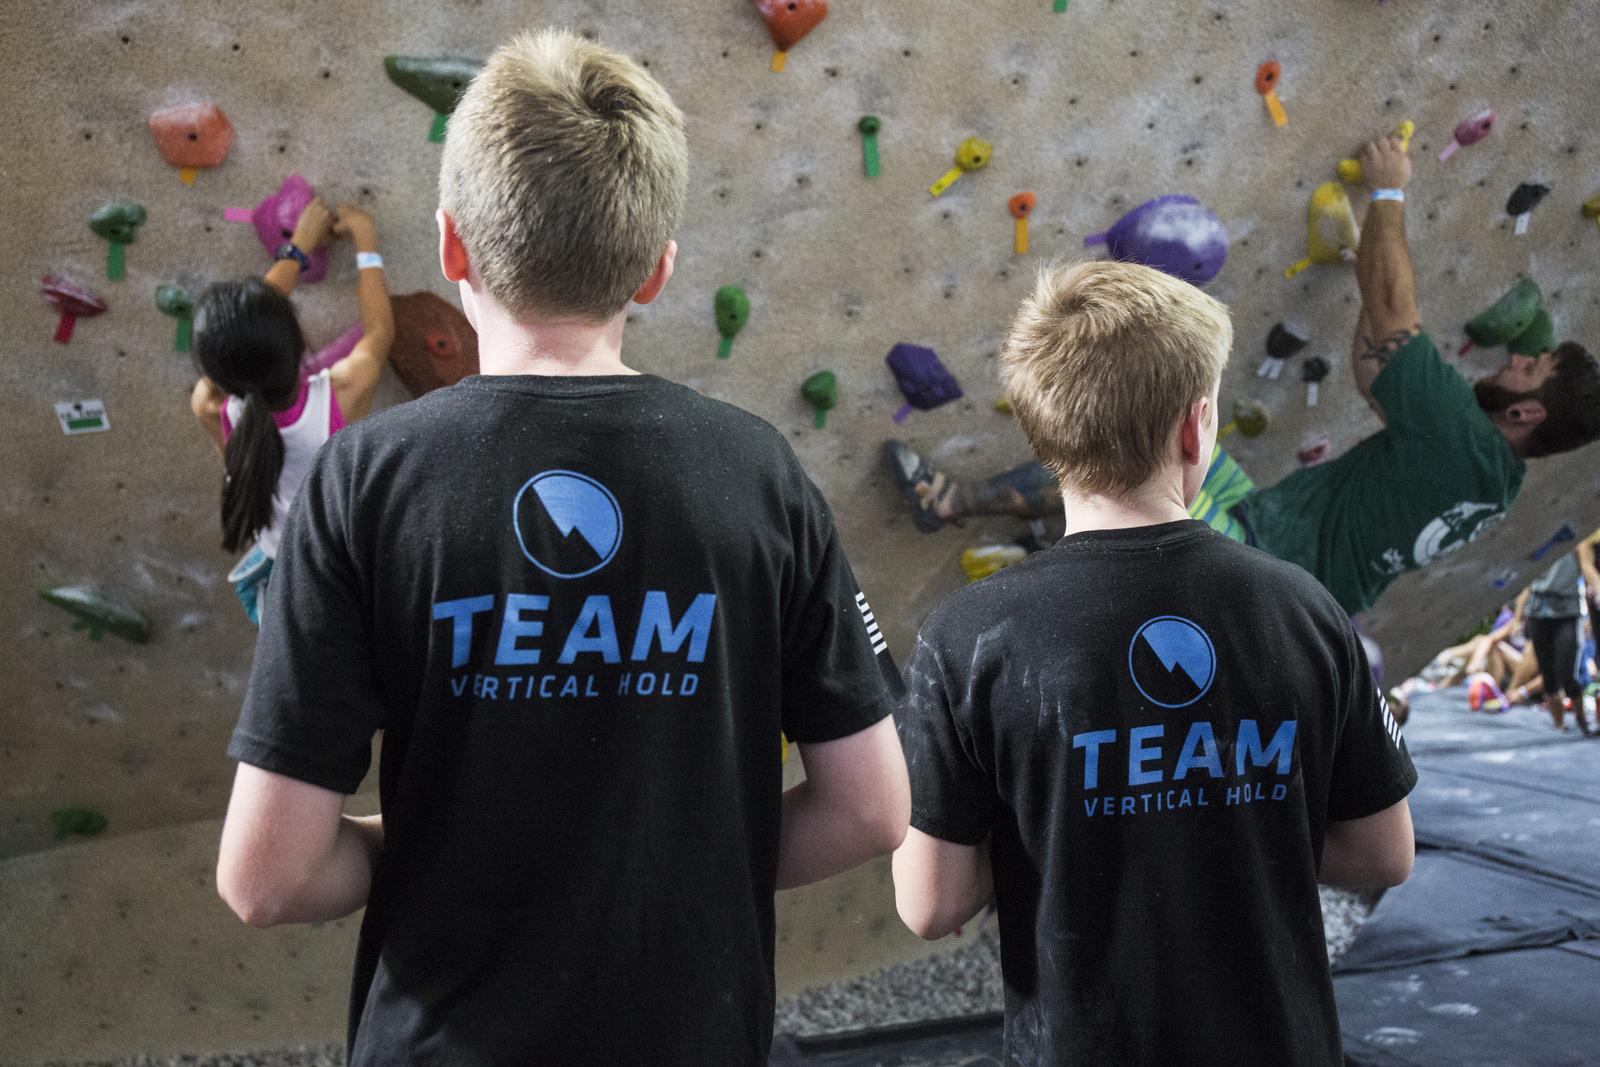 vertical-hold-youth-team-003.jpg